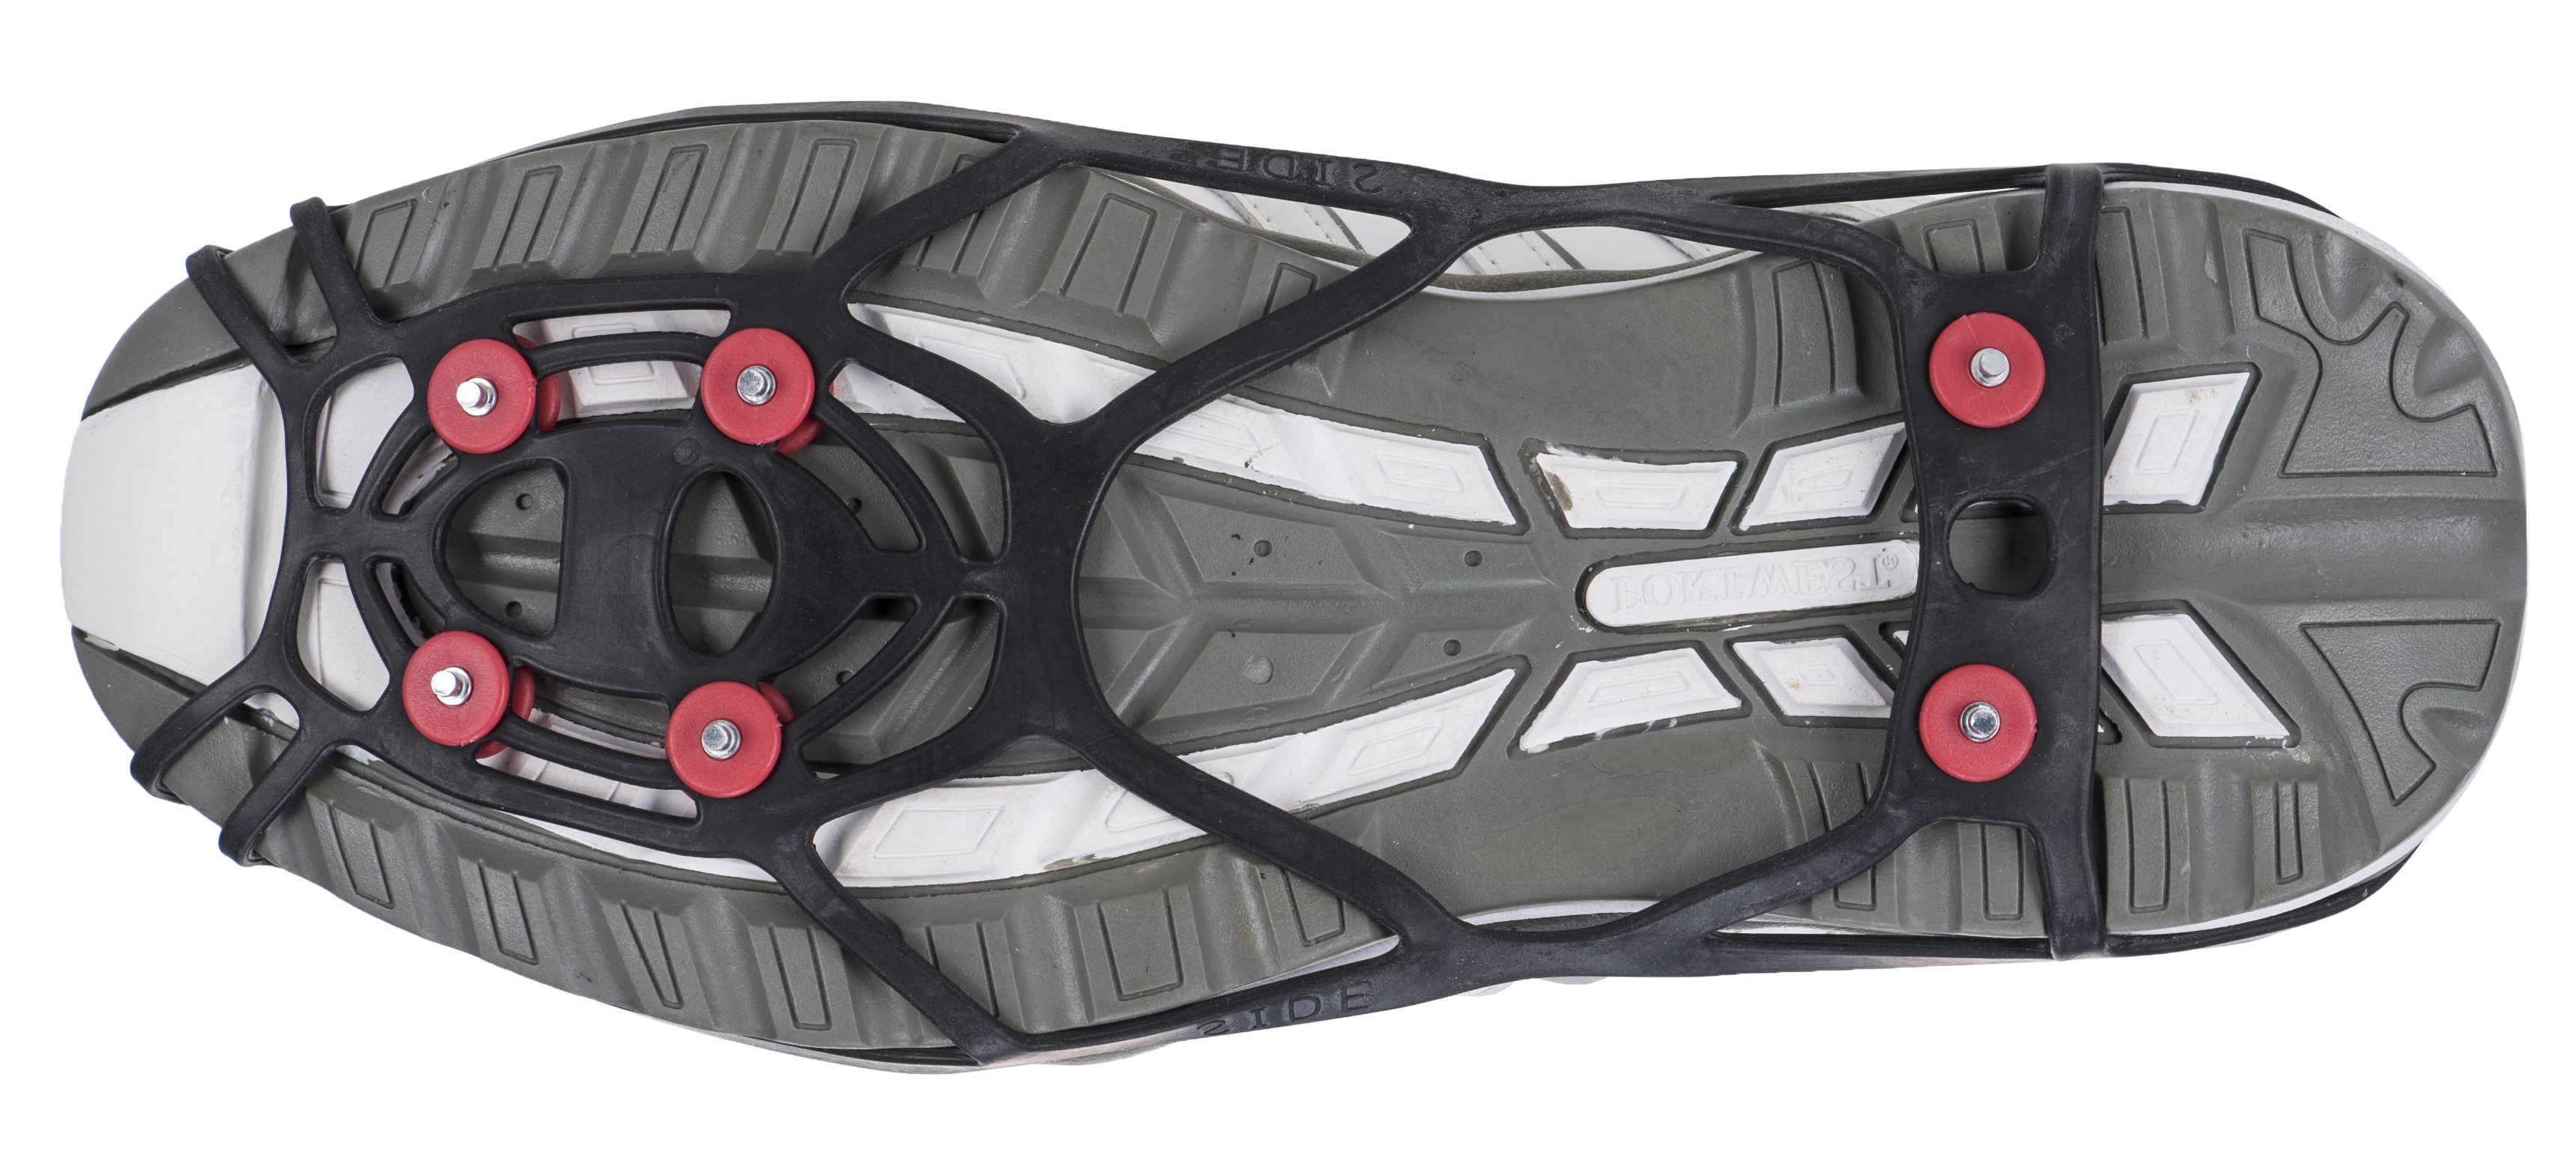 good quality best sale best loved Crampons Grips pour chaussure pour le verglas